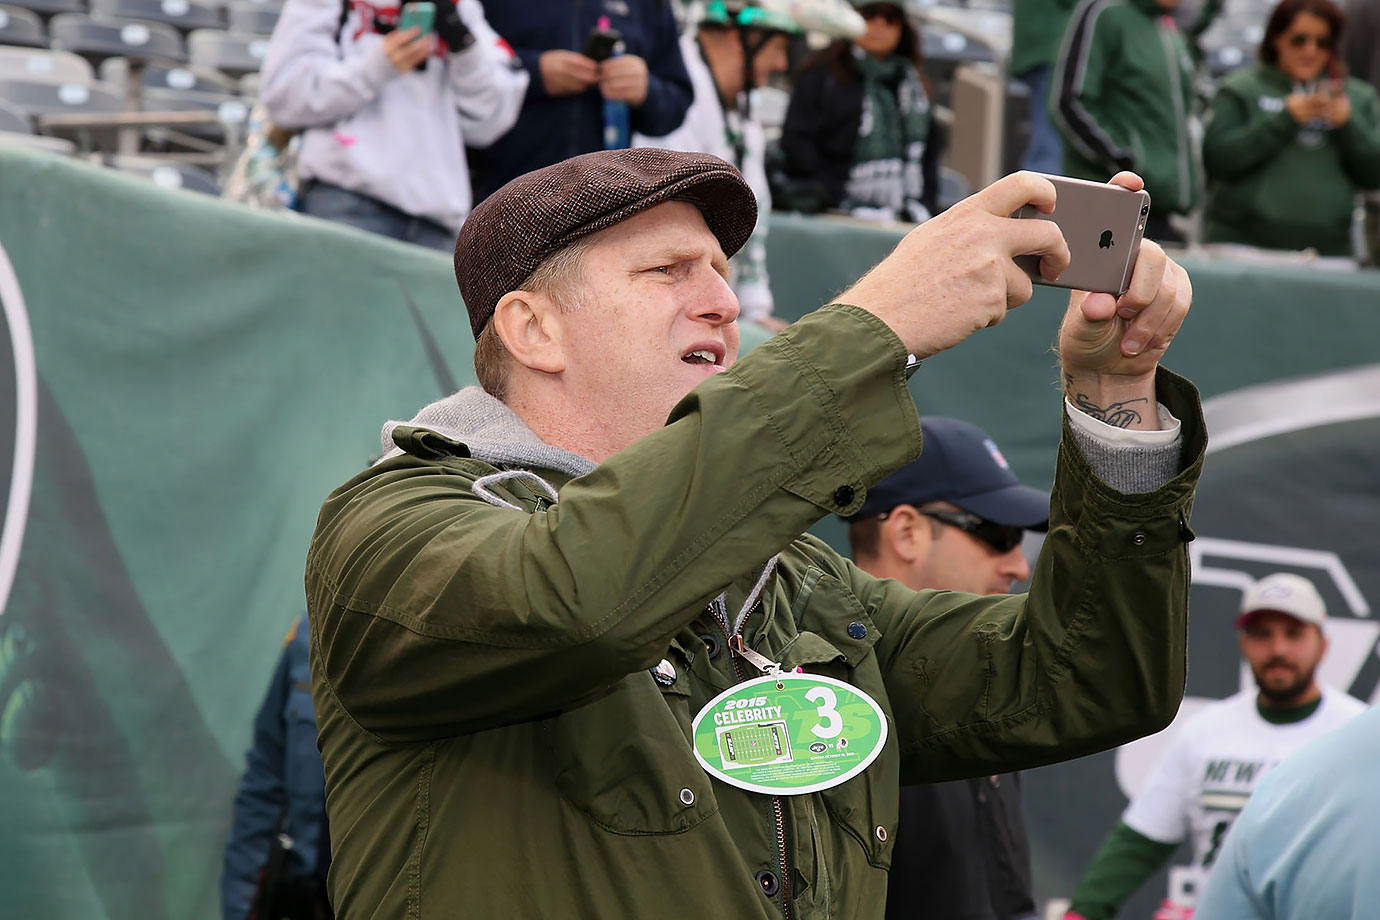 New York Jets vs. Washington Redskins on Oct. 18, 2015 at MetLife Stadium in East Rutherford, N.J.